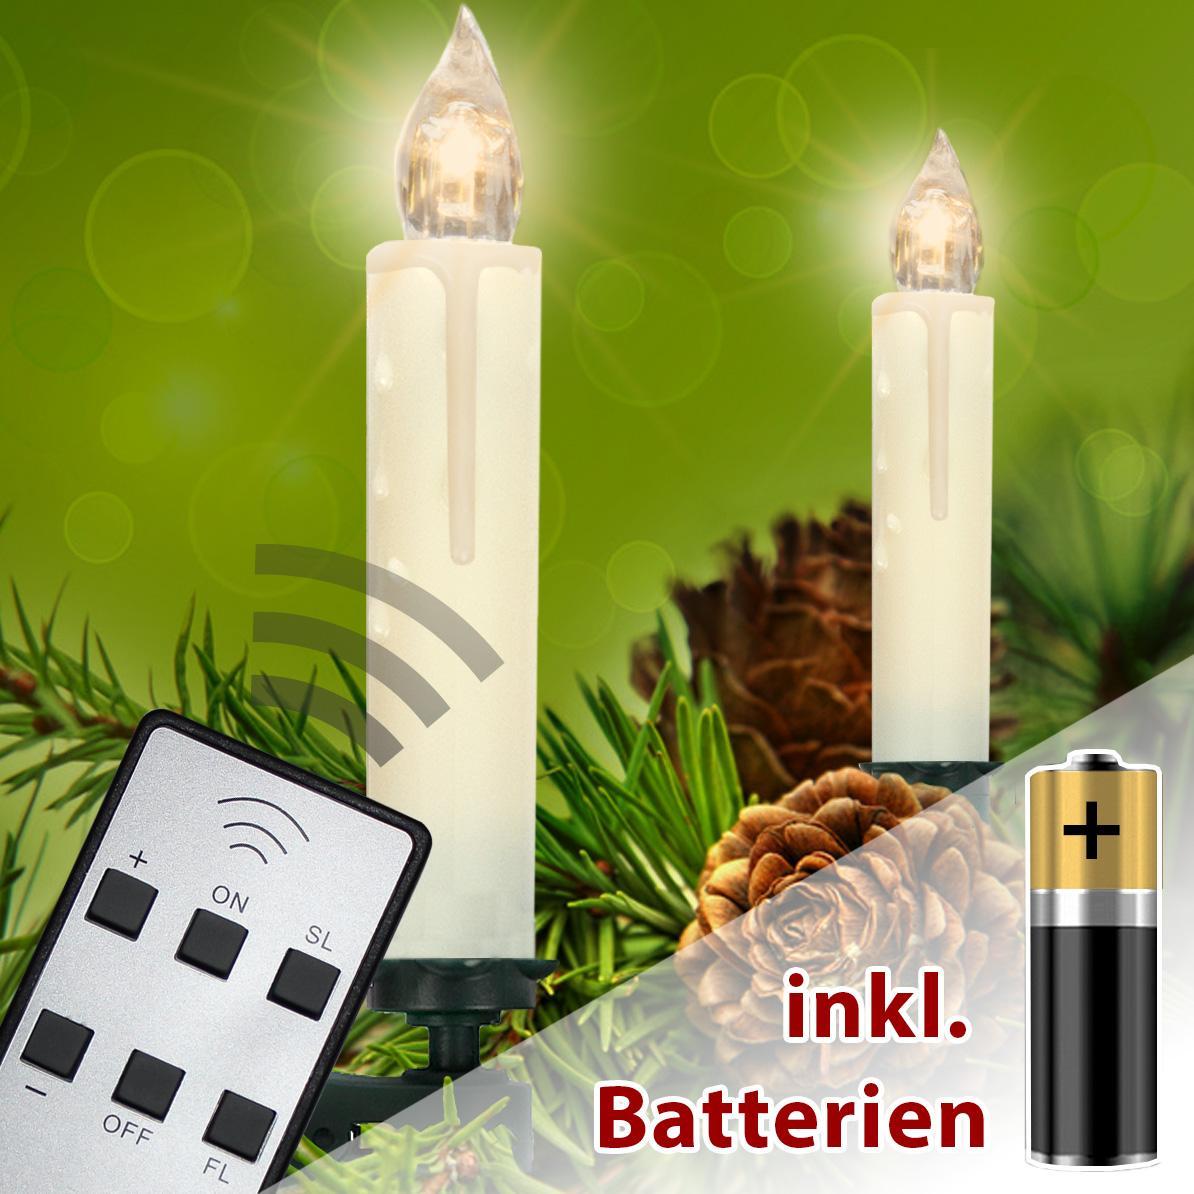 12 L/üftungsschlitze Schweinelampe Koll Living Infrarot-W/ärmestrahlger/ät 150W K/ükenlampe Made in Germany